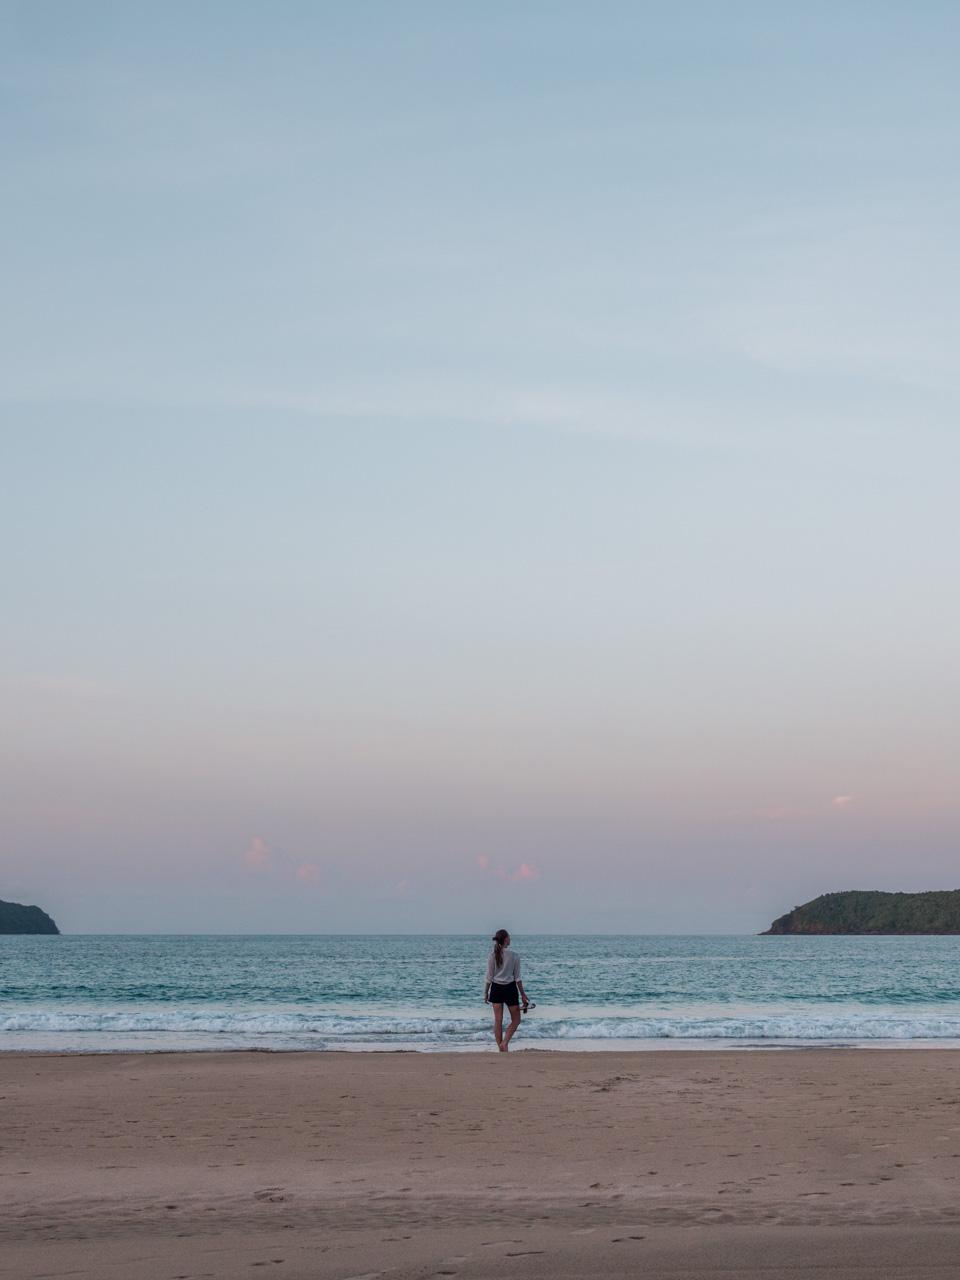 Victoria on Nacpan Beach at dusk